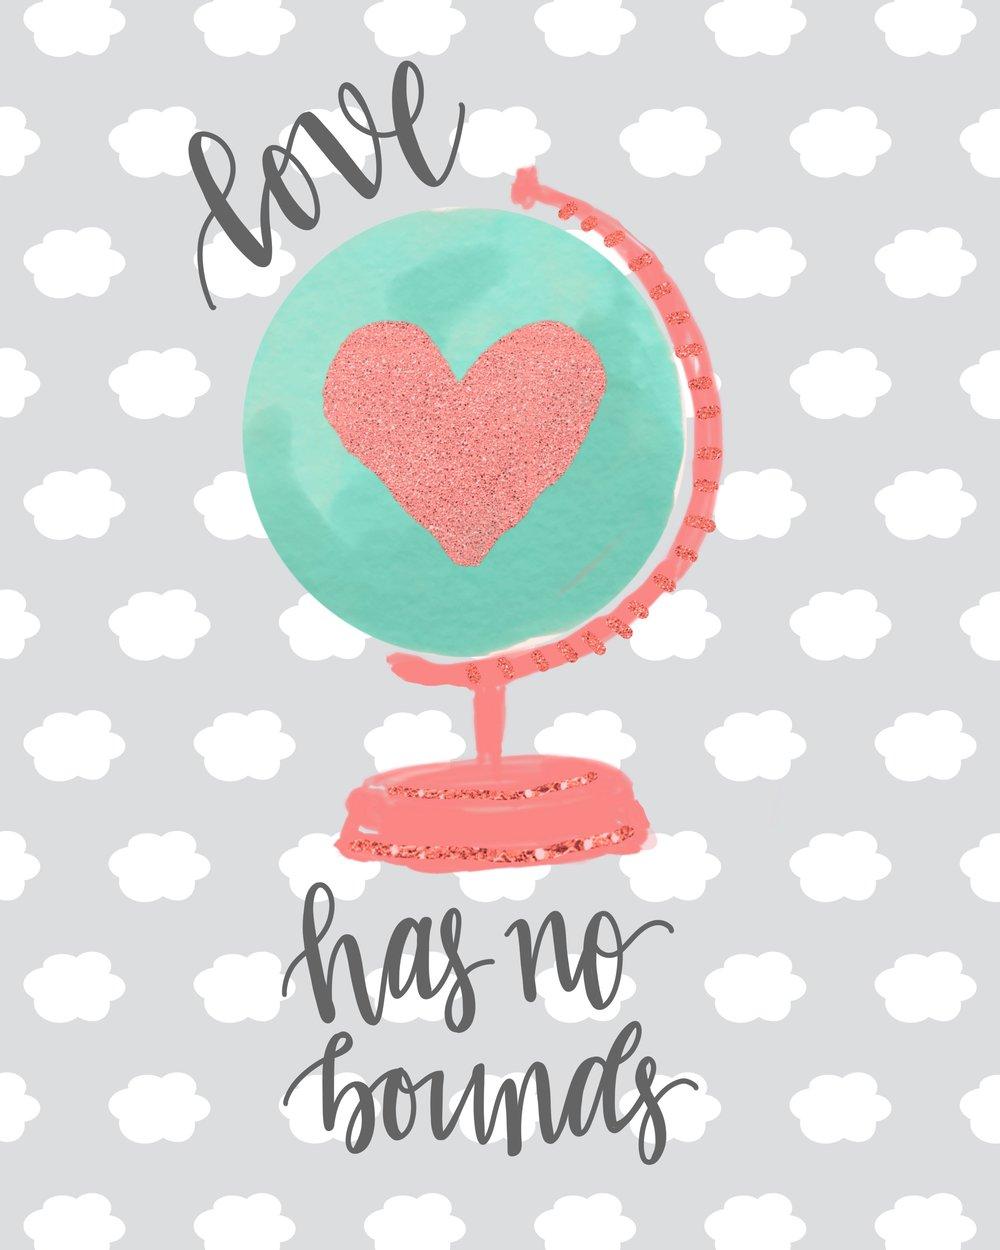 Love has no bounds2.jpg